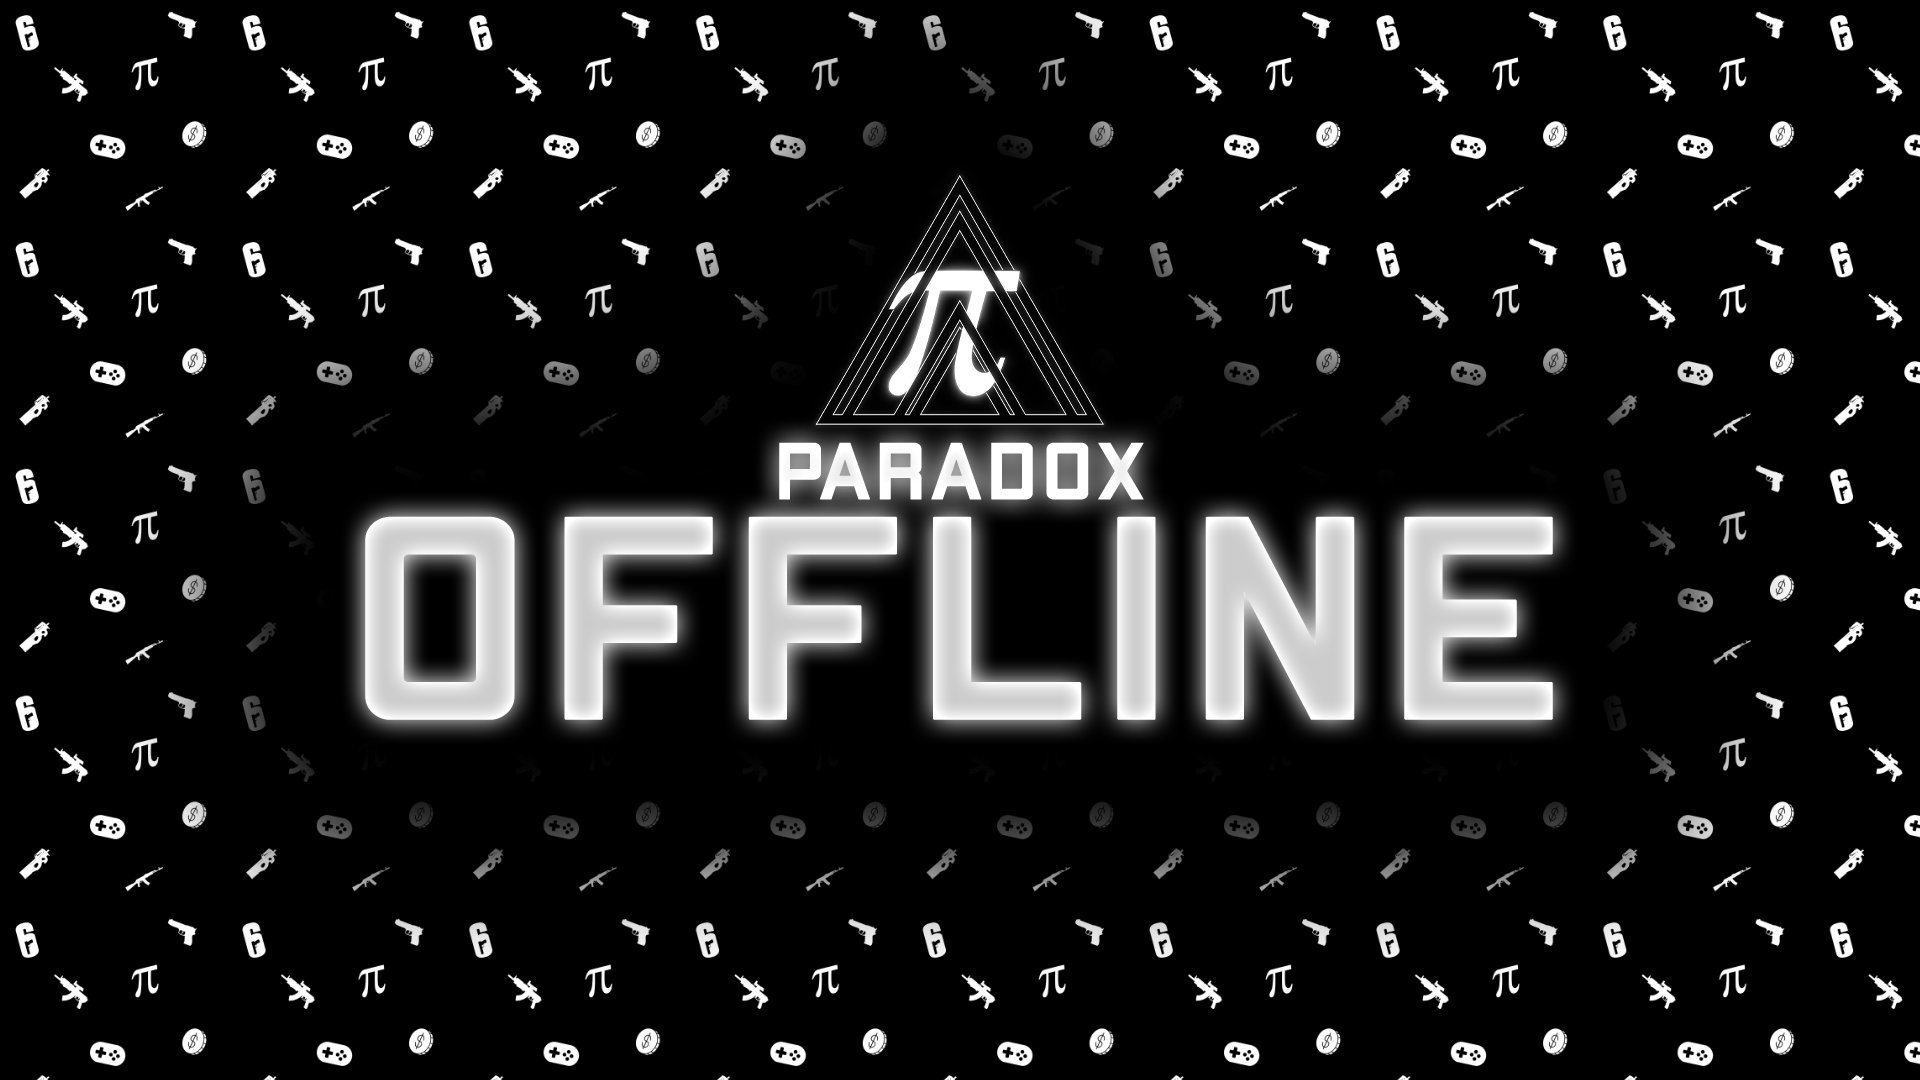 Twitch stream of ParaDoxTVr6